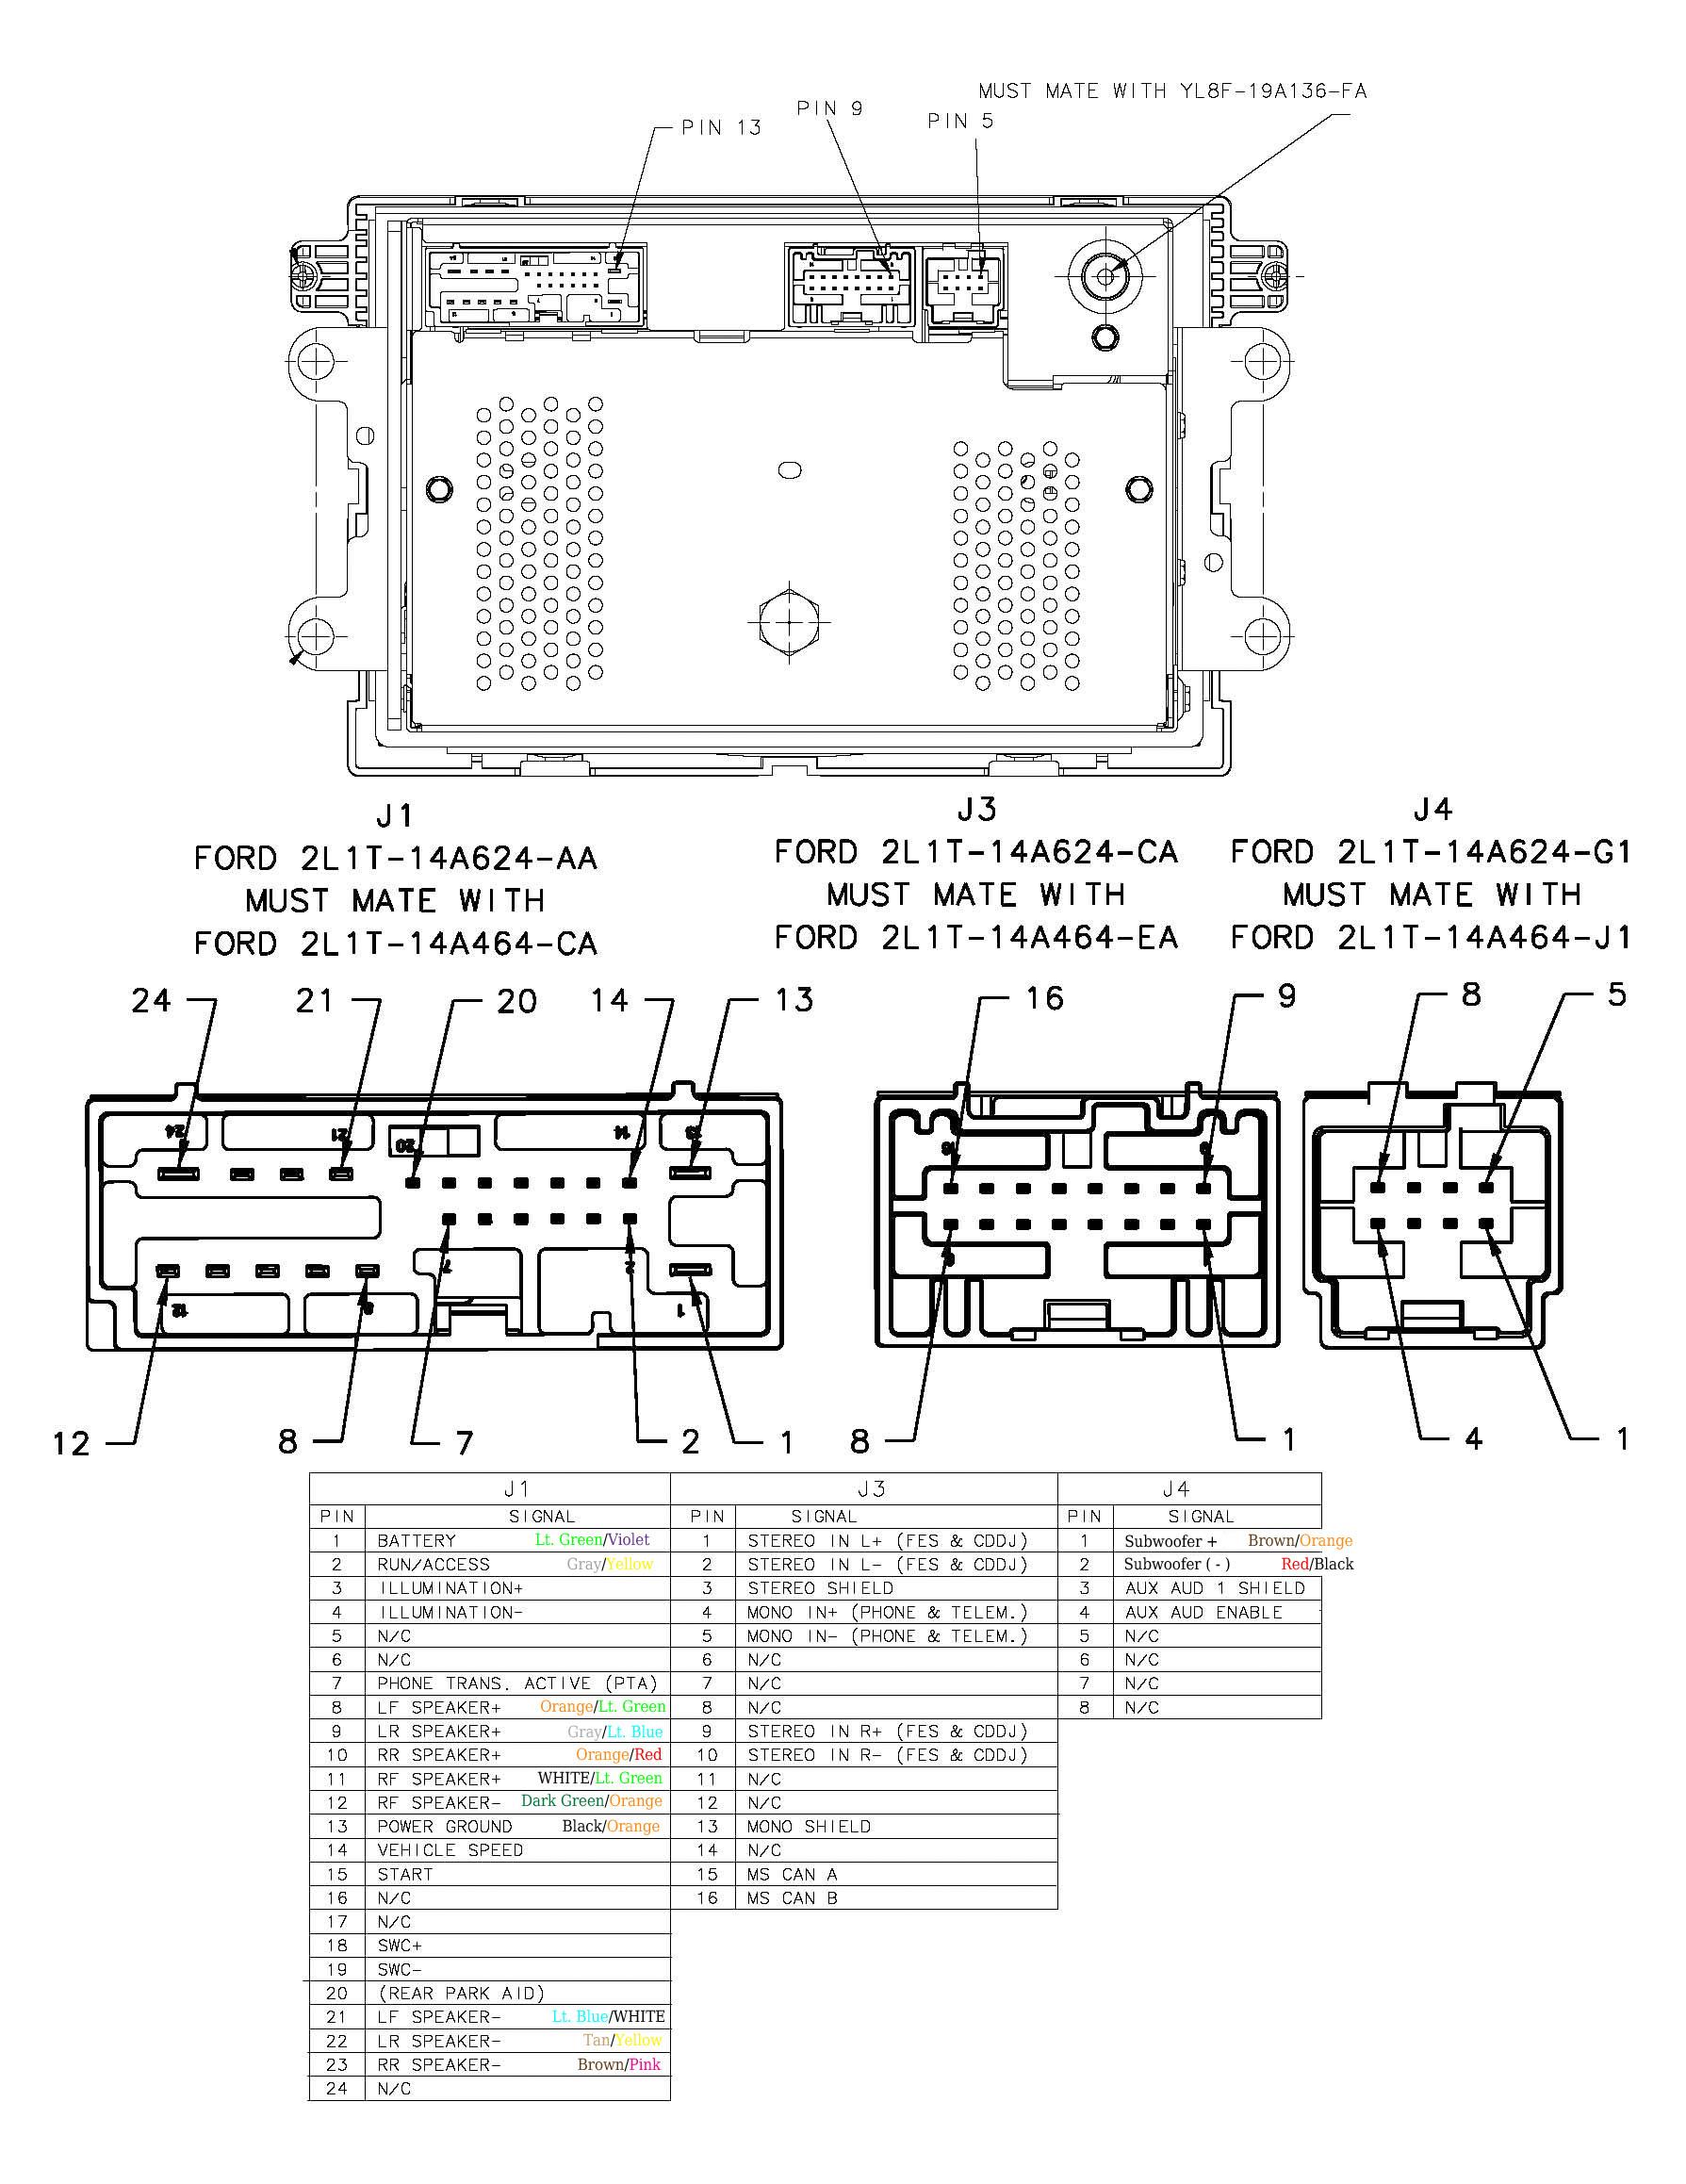 2007 ford mustang radio wiring diagram 1999 v6 shaker get free